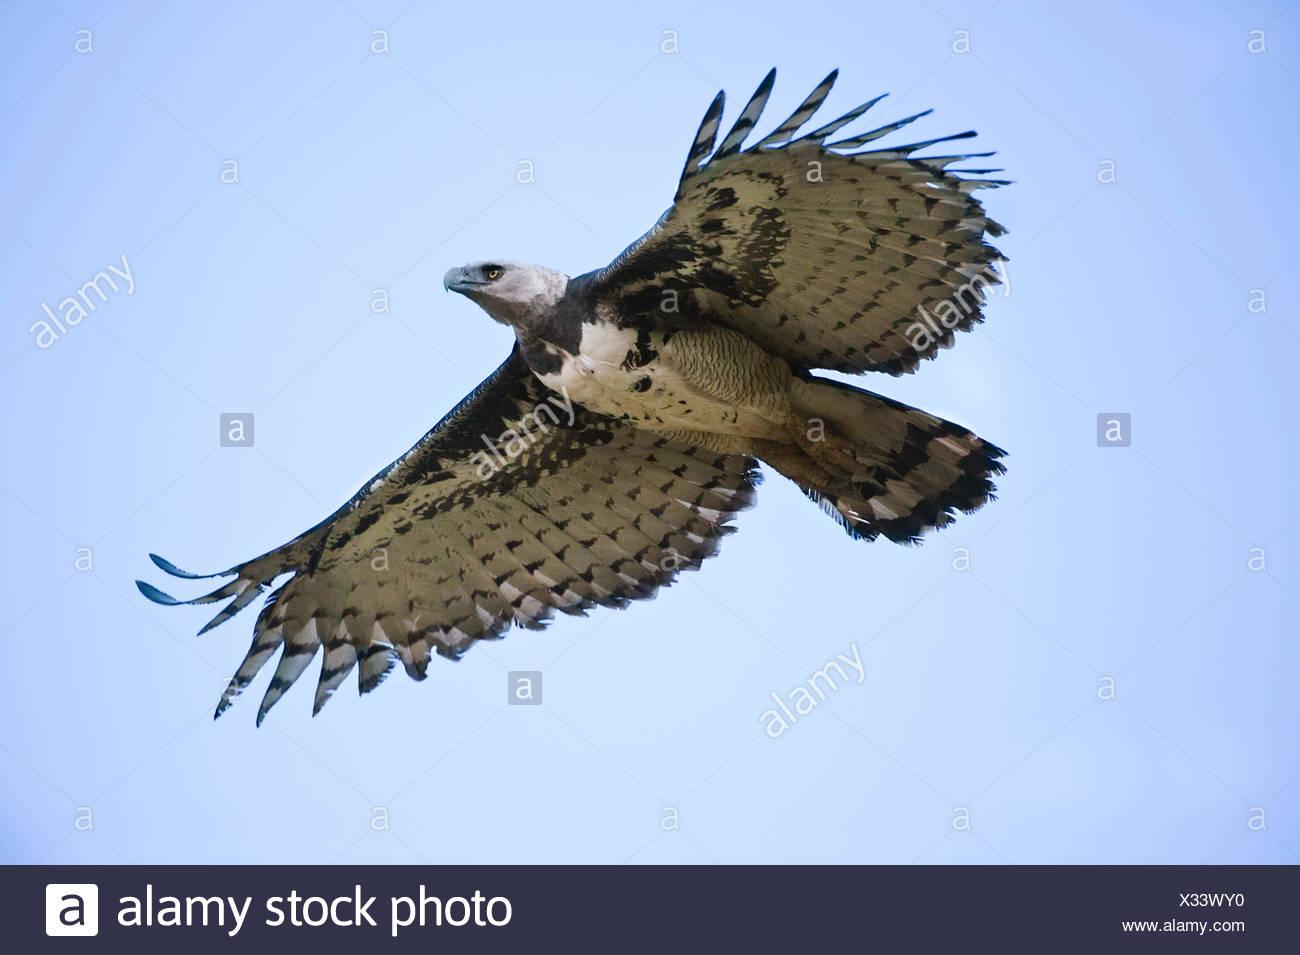 american harpy eagle stock photos american harpy eagle stock